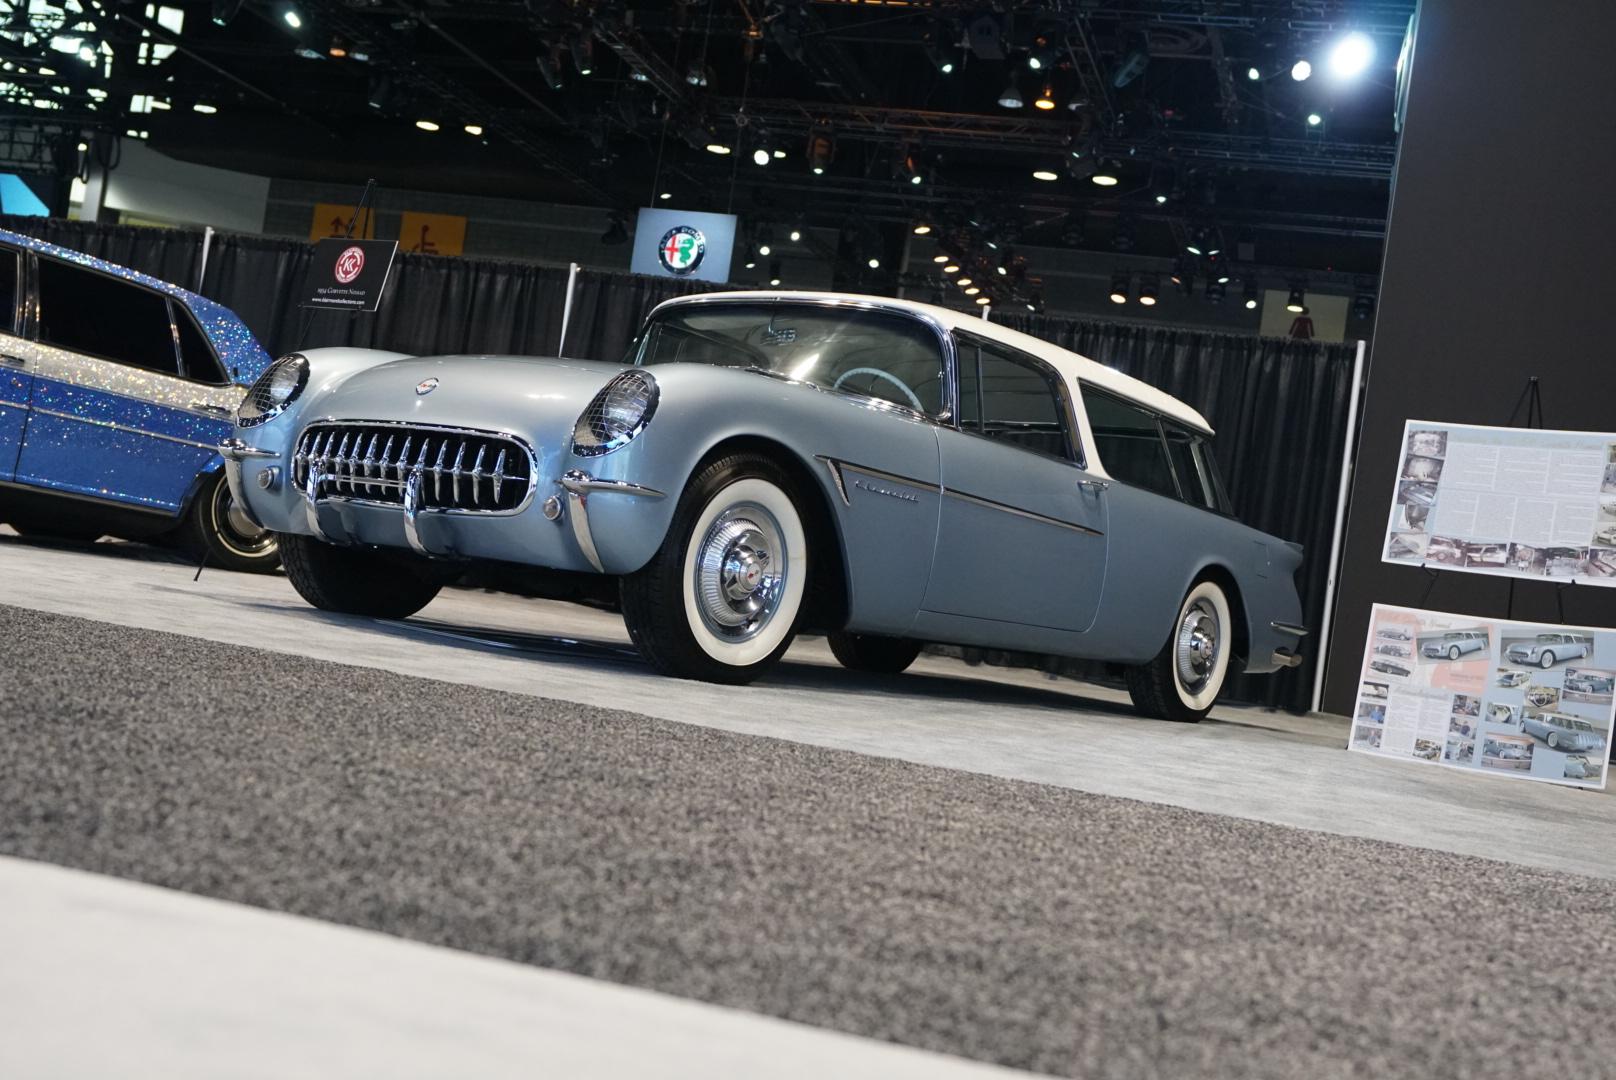 1954 Chevrolet Corvette Nomad replica front three-quarter